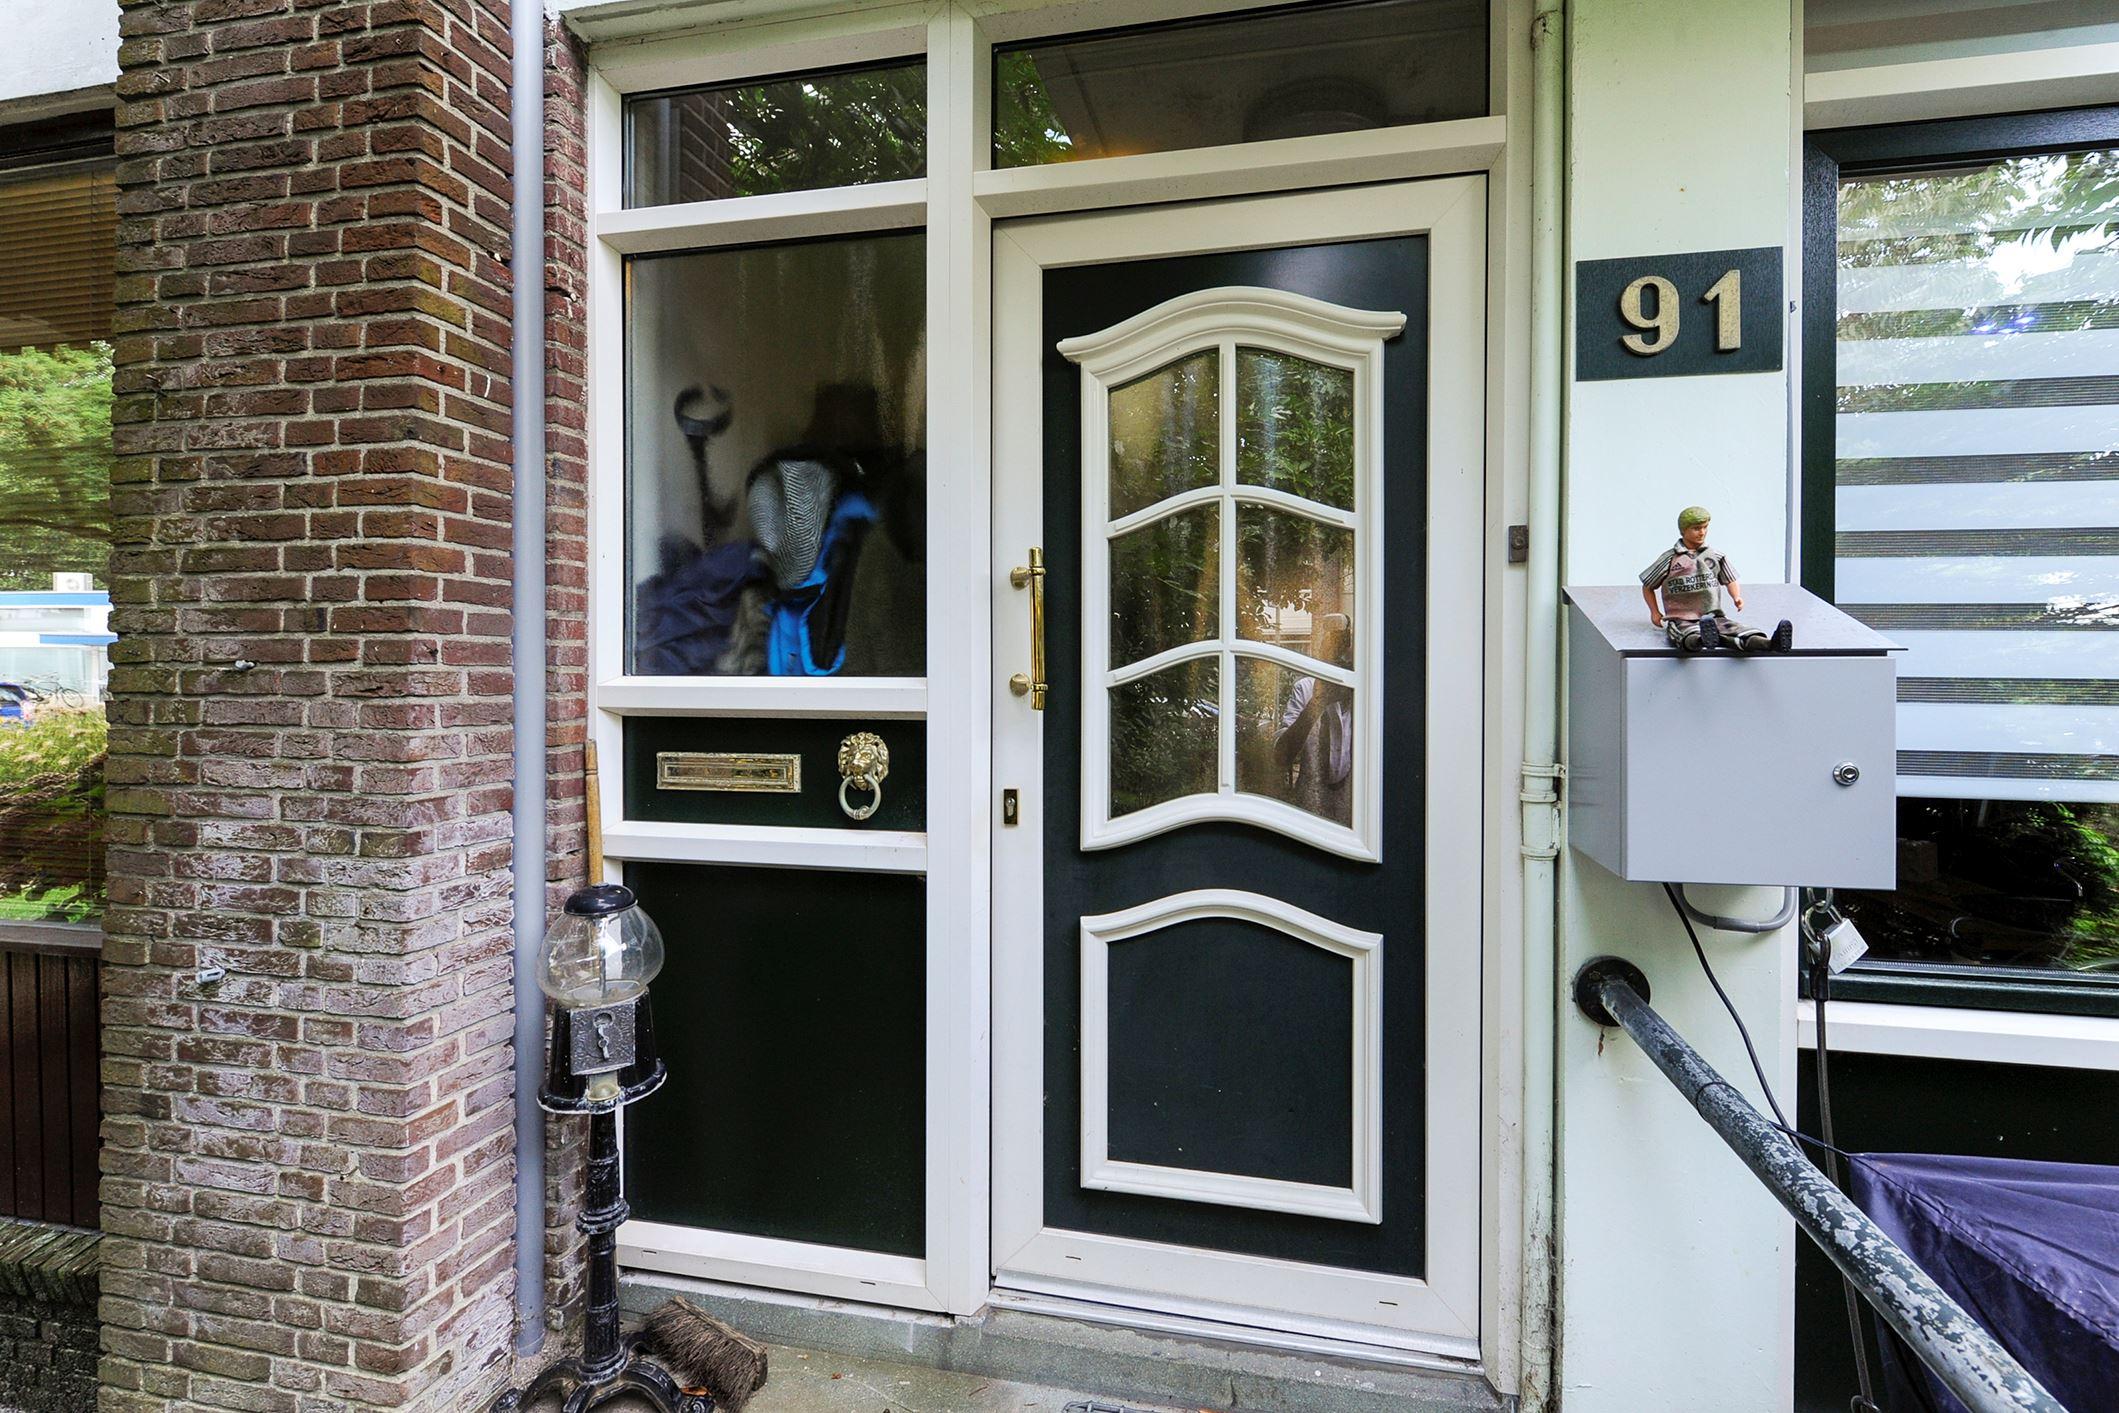 Huis te koop: haverkamp 91 2592 ax den haag [funda]